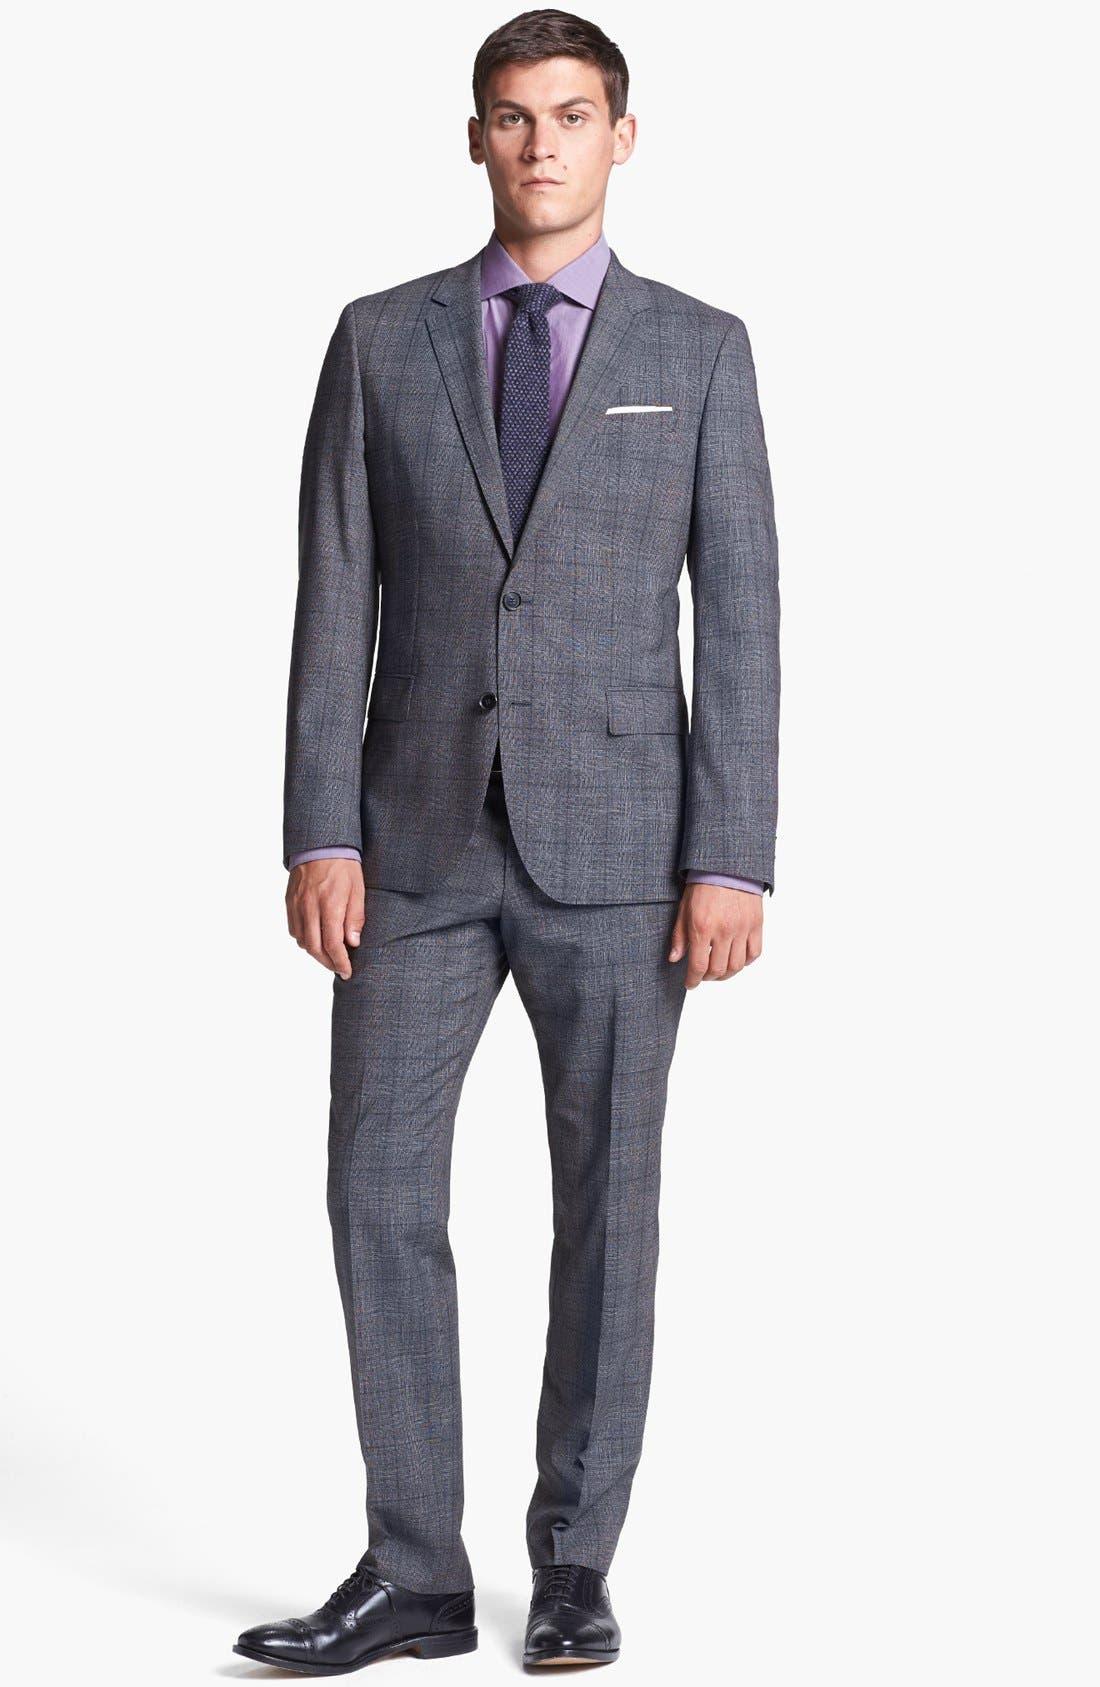 Main Image - BOSS HUGO BOSS 'Huge/Genius' Trim Fit Plaid Suit